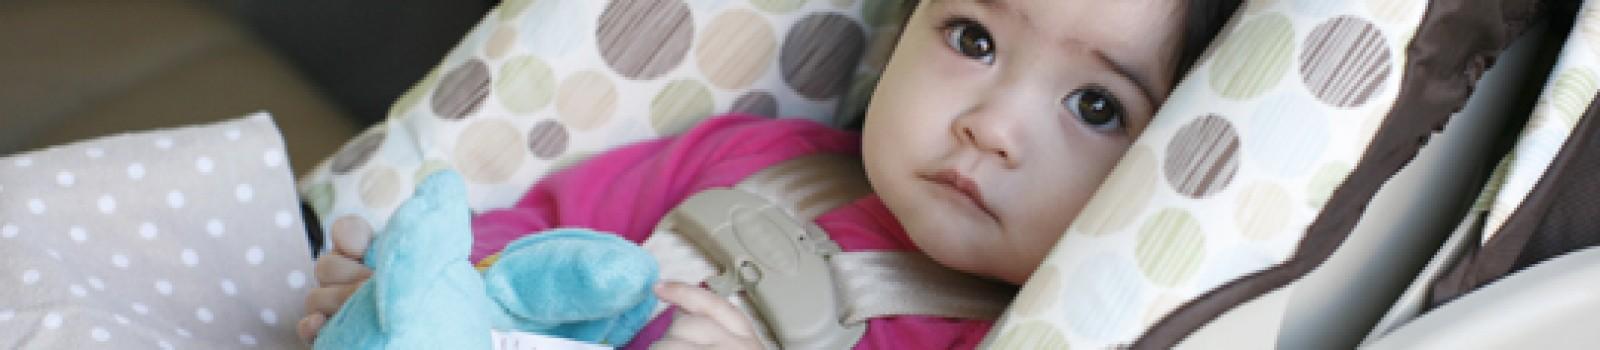 safest infant car seats, car seat for infant, best car seats for baby